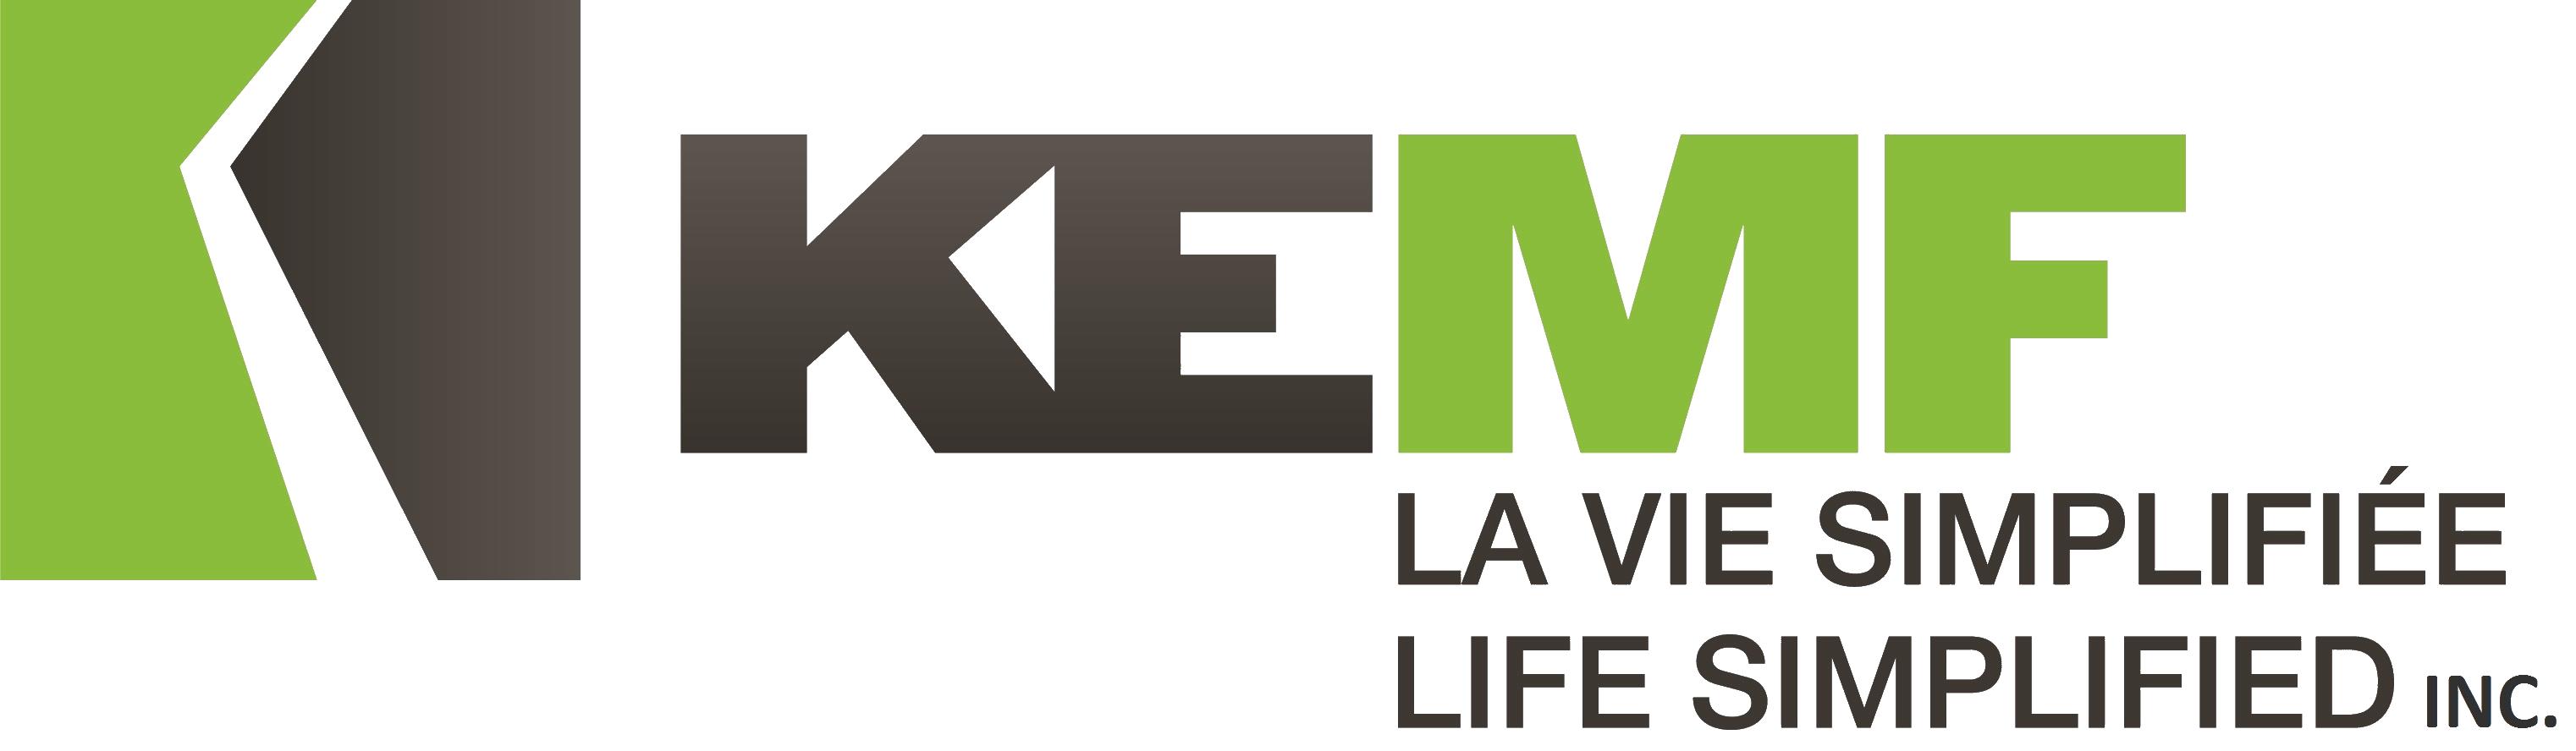 Heating Mat, Pool Filter & Gutter Improvement Store Image - KEMF Life Simplified Inc.